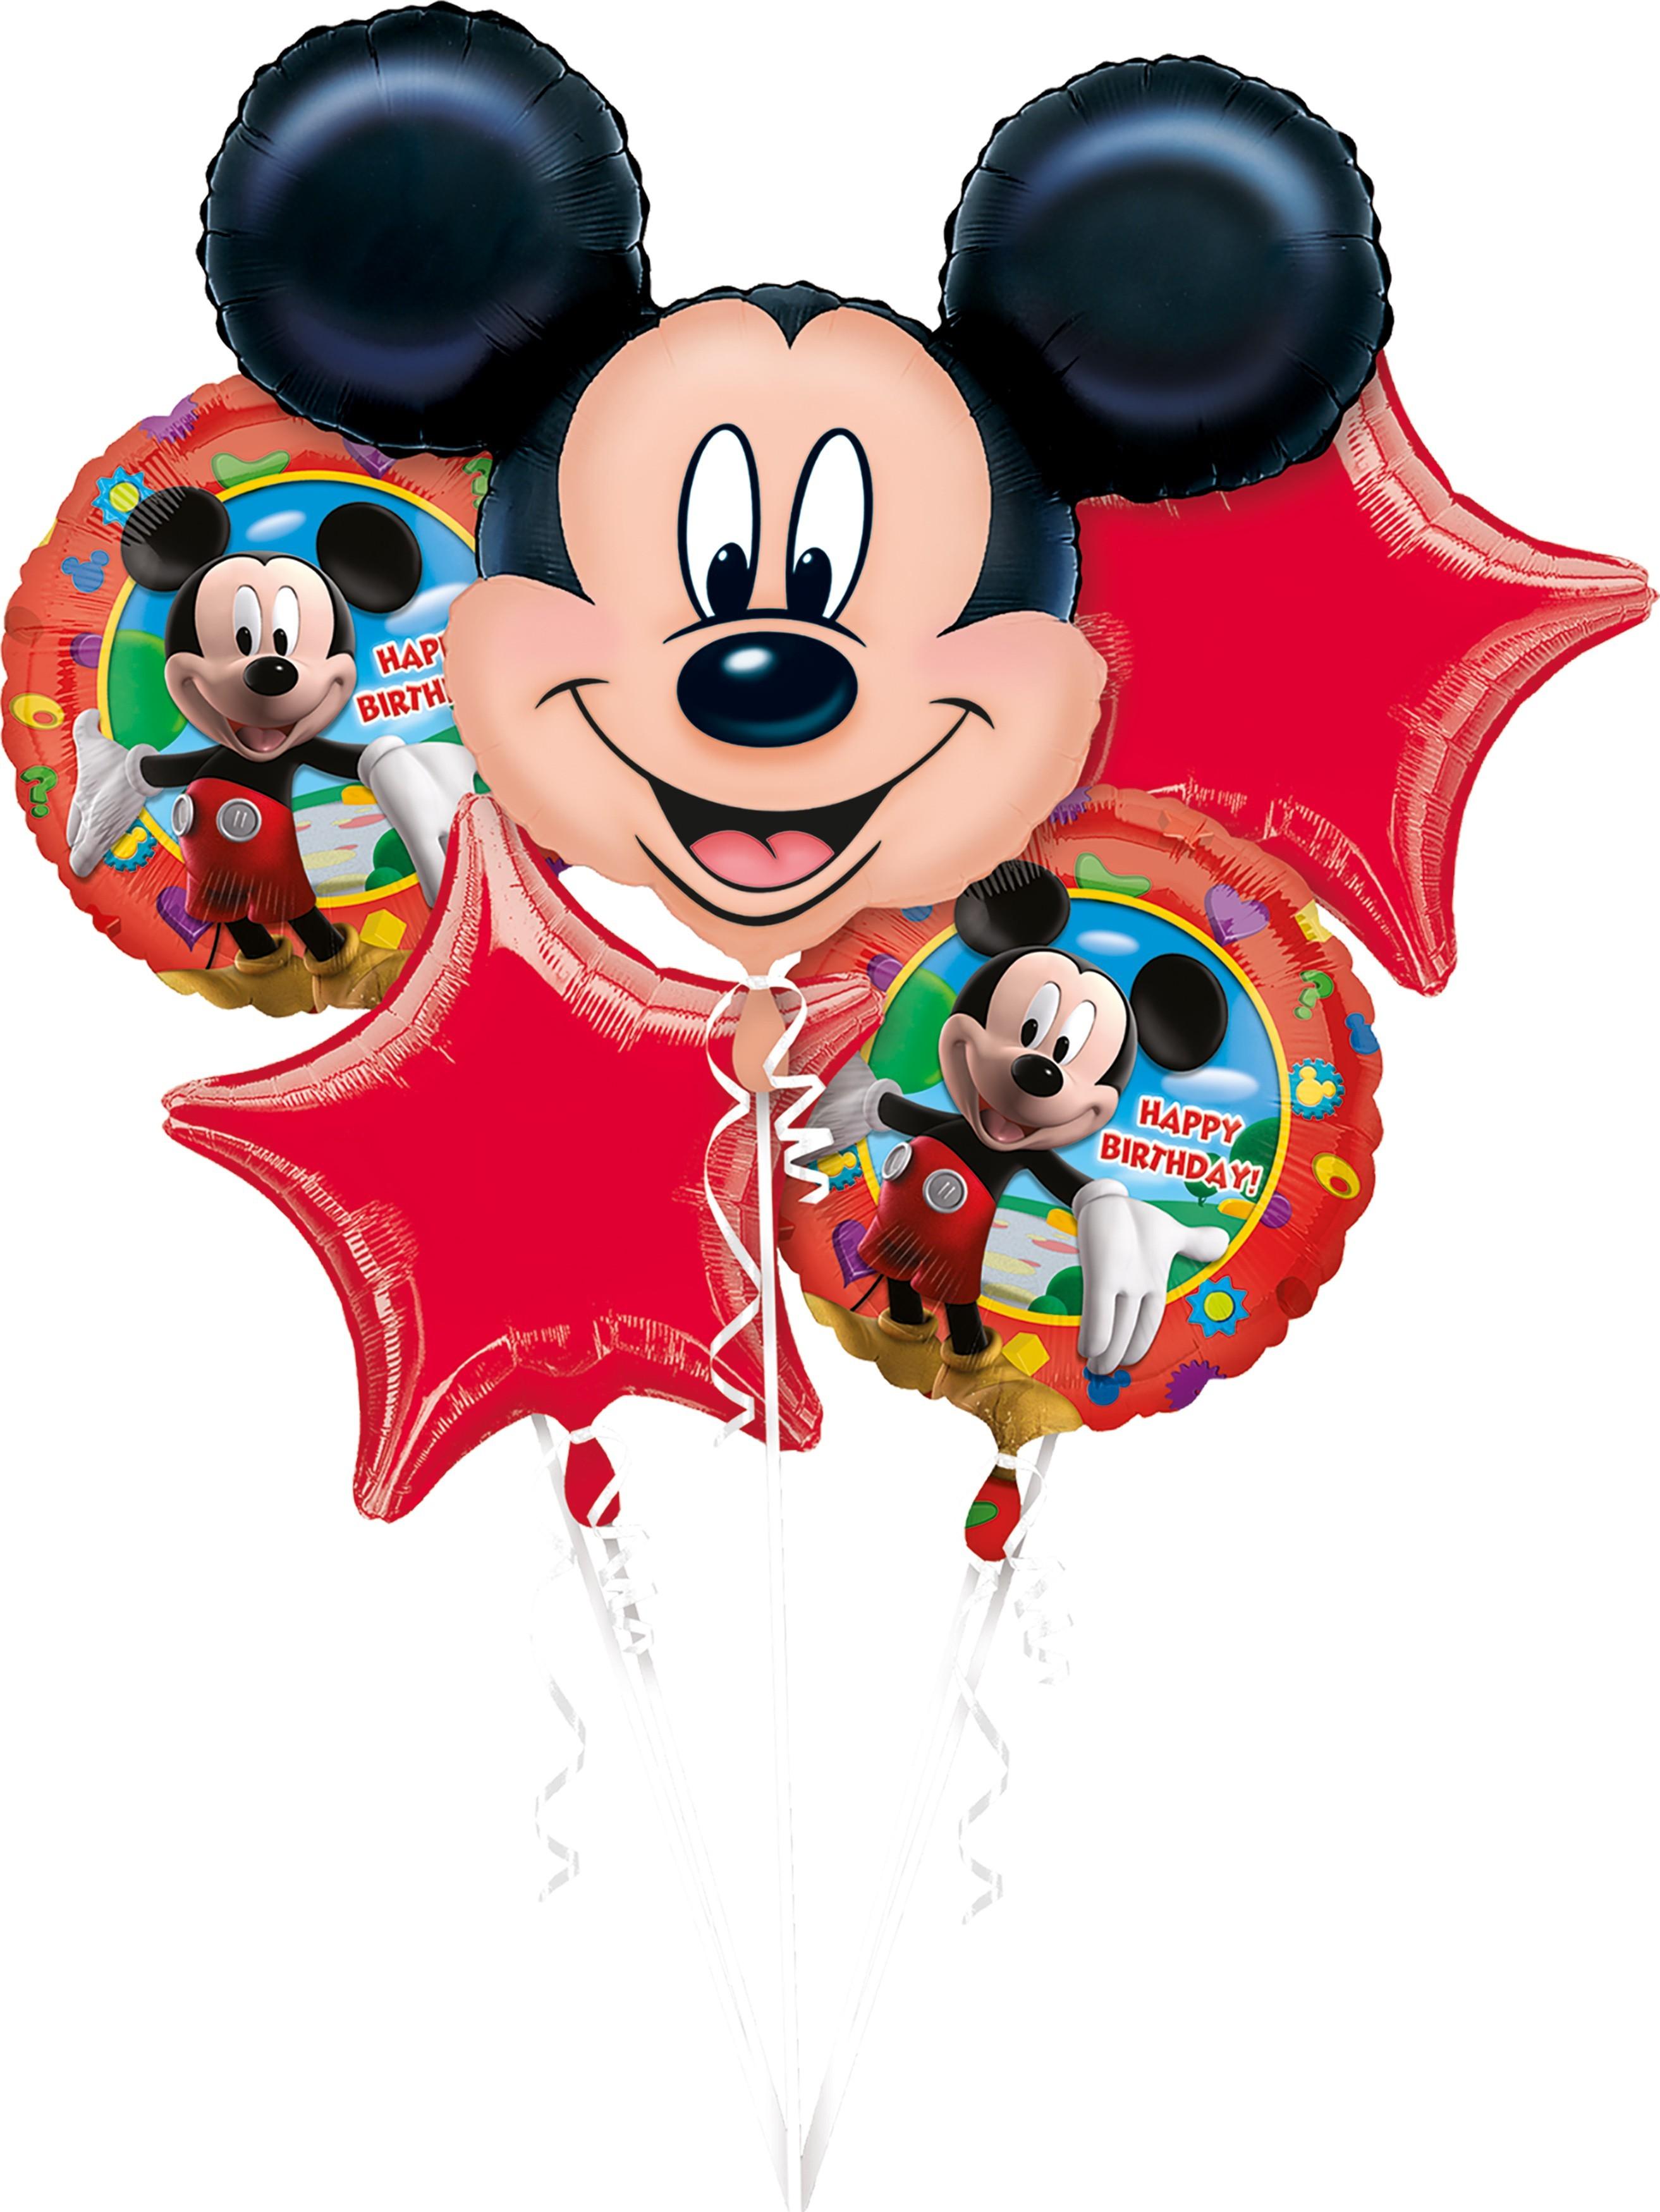 Esponja cabeza SpongBob globos XXL folienballon cumpleaños helio fiesta